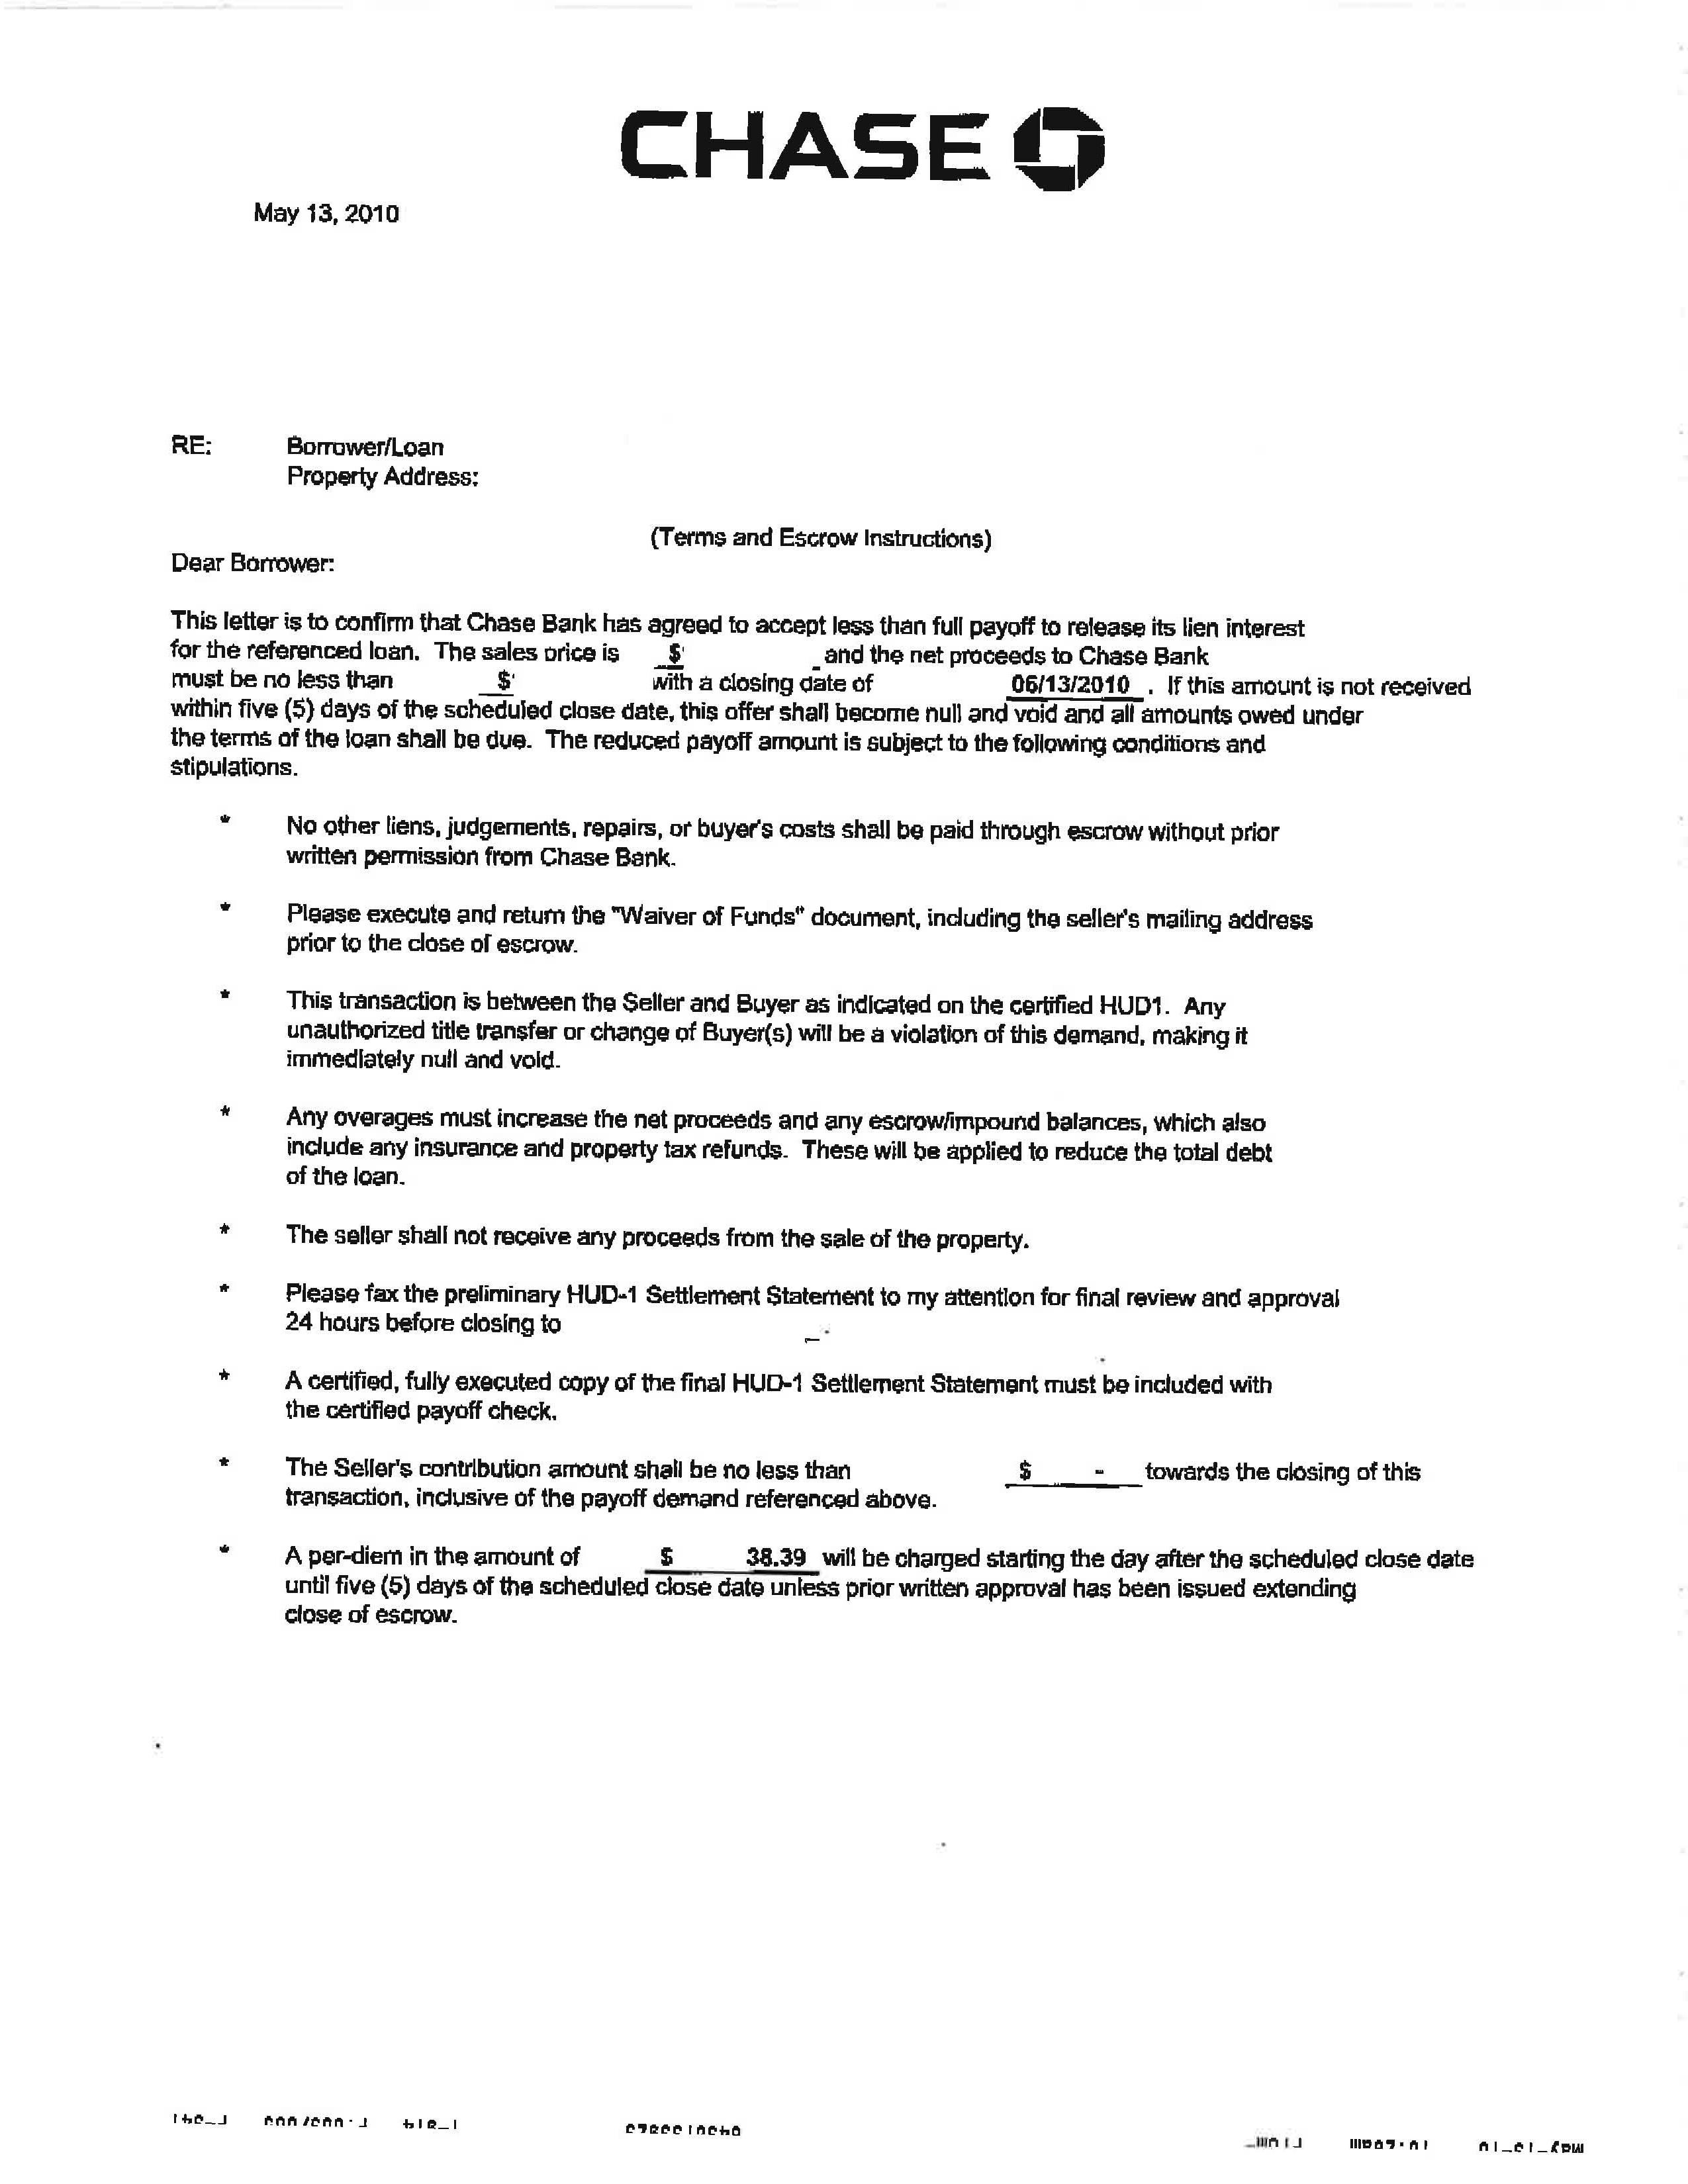 Request Letter For Bill Approval – Debit Note Letter Sample